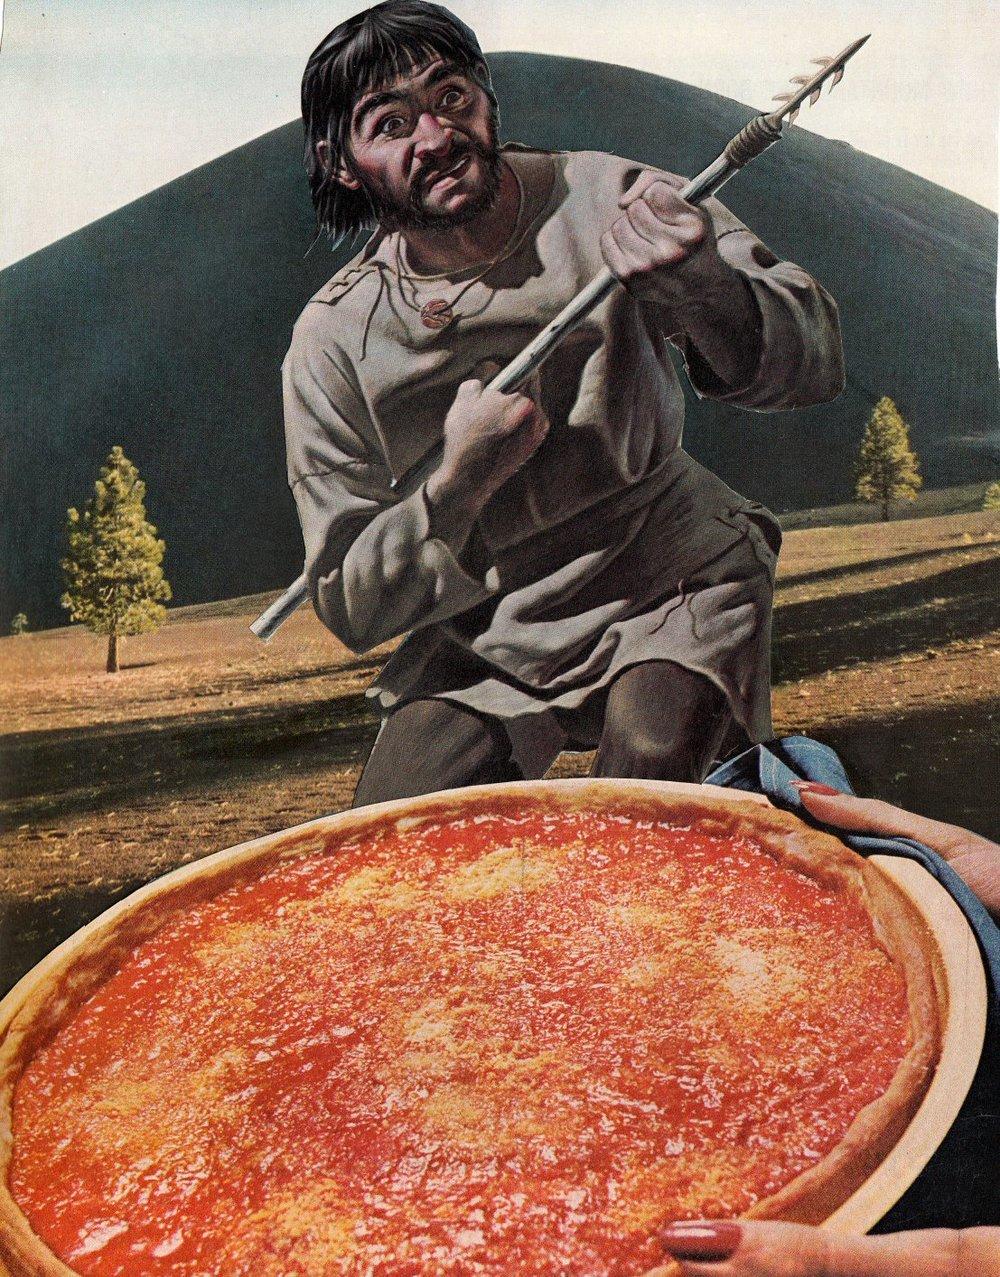 pizzahunt.jpg